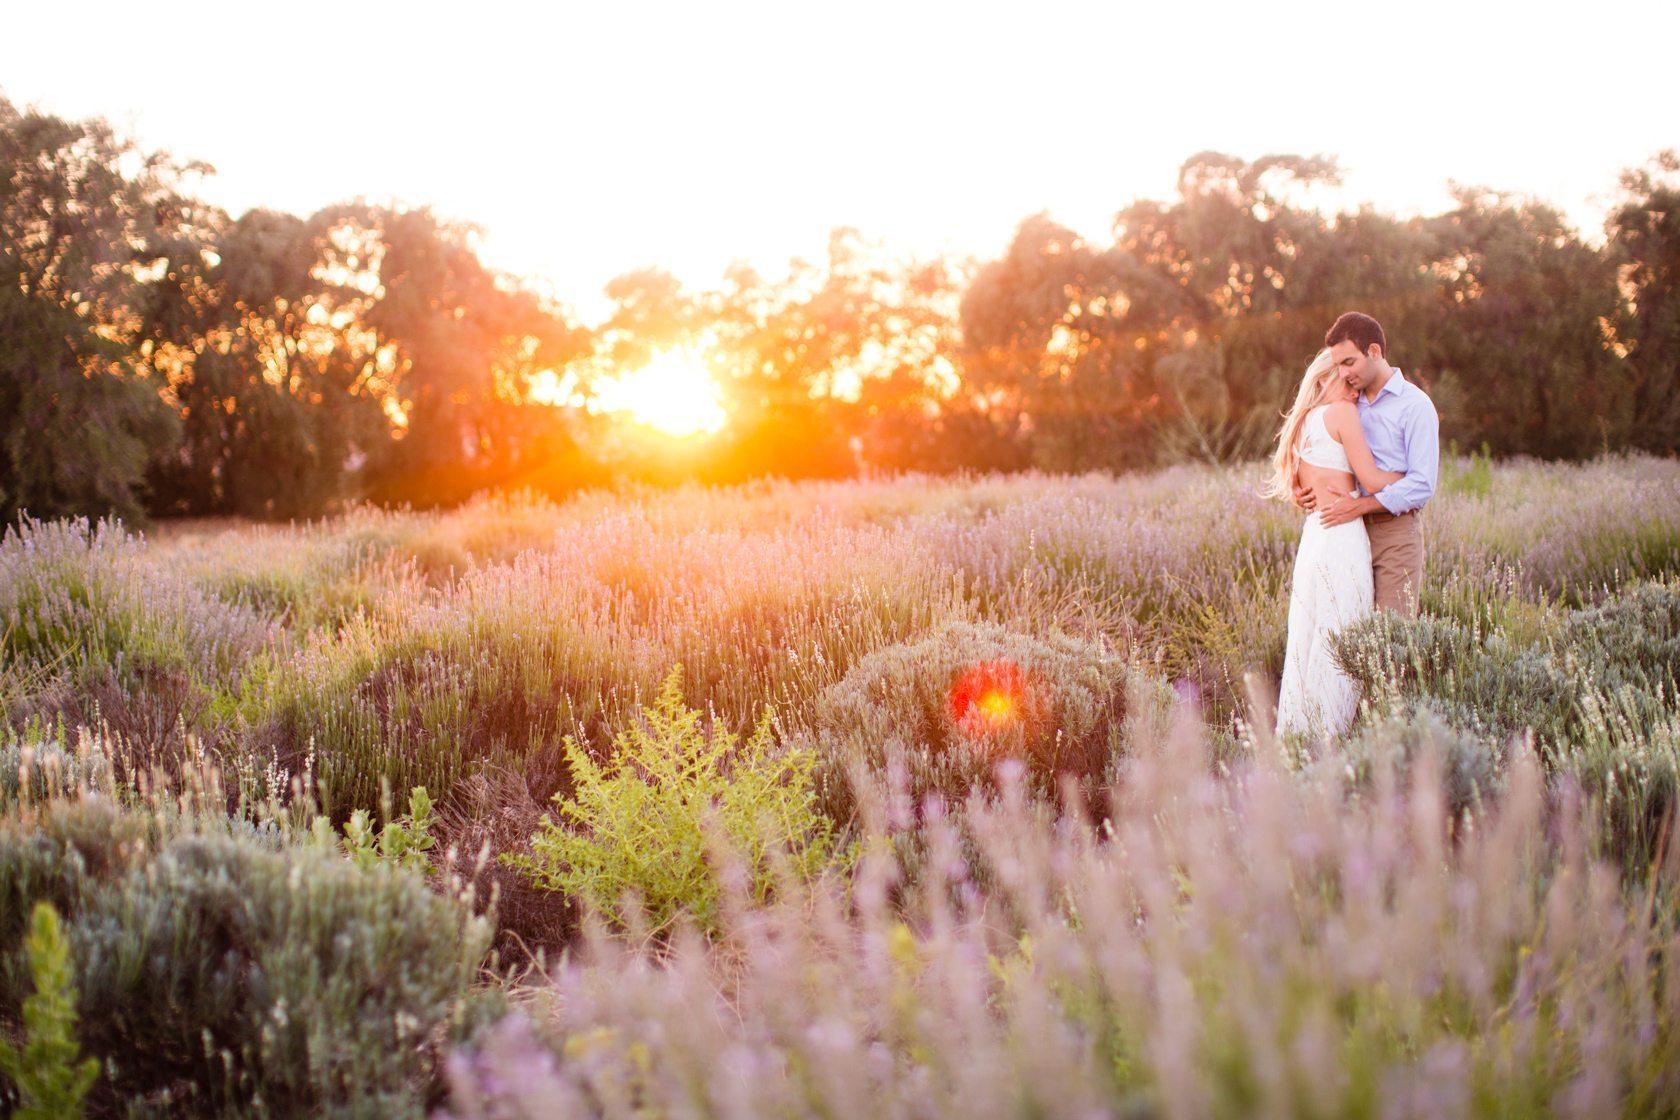 Highland_Springs_Lavender_Field_Engagement_43.jpg